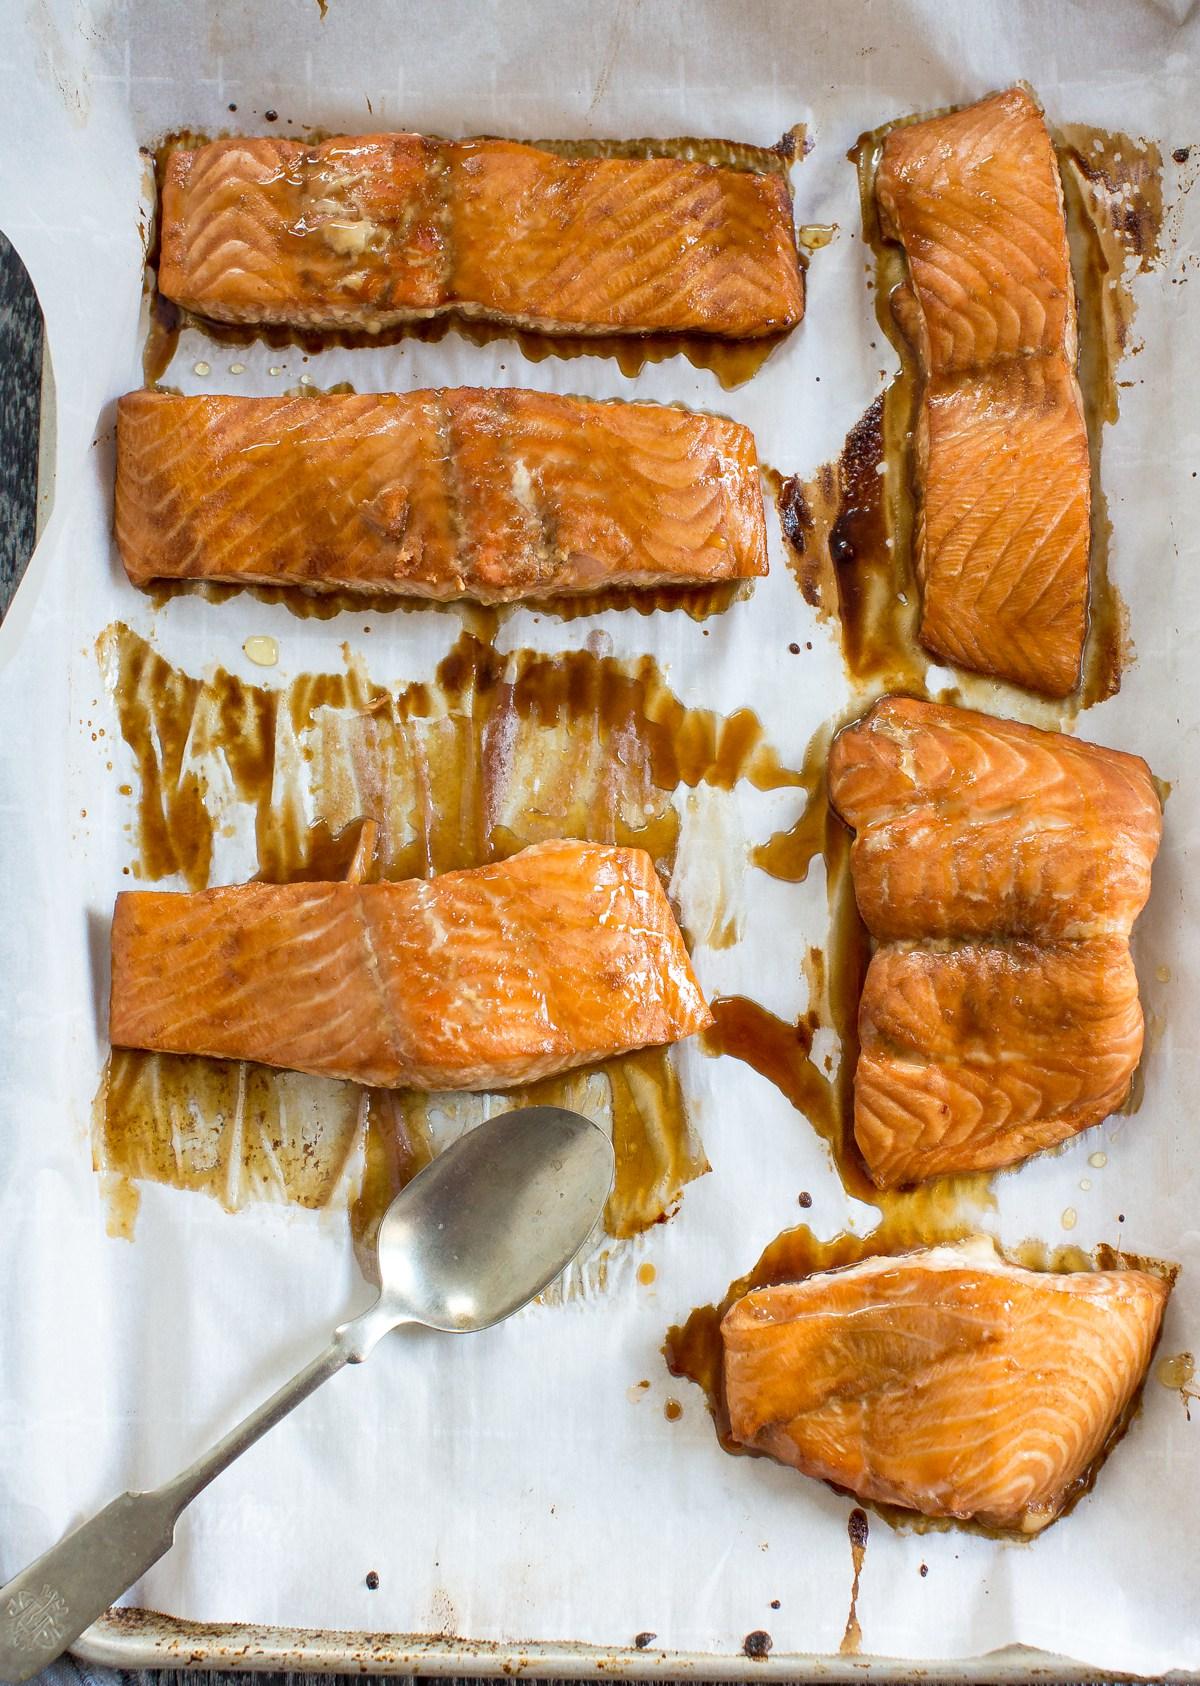 Marinated Salmon on a Baking Tray